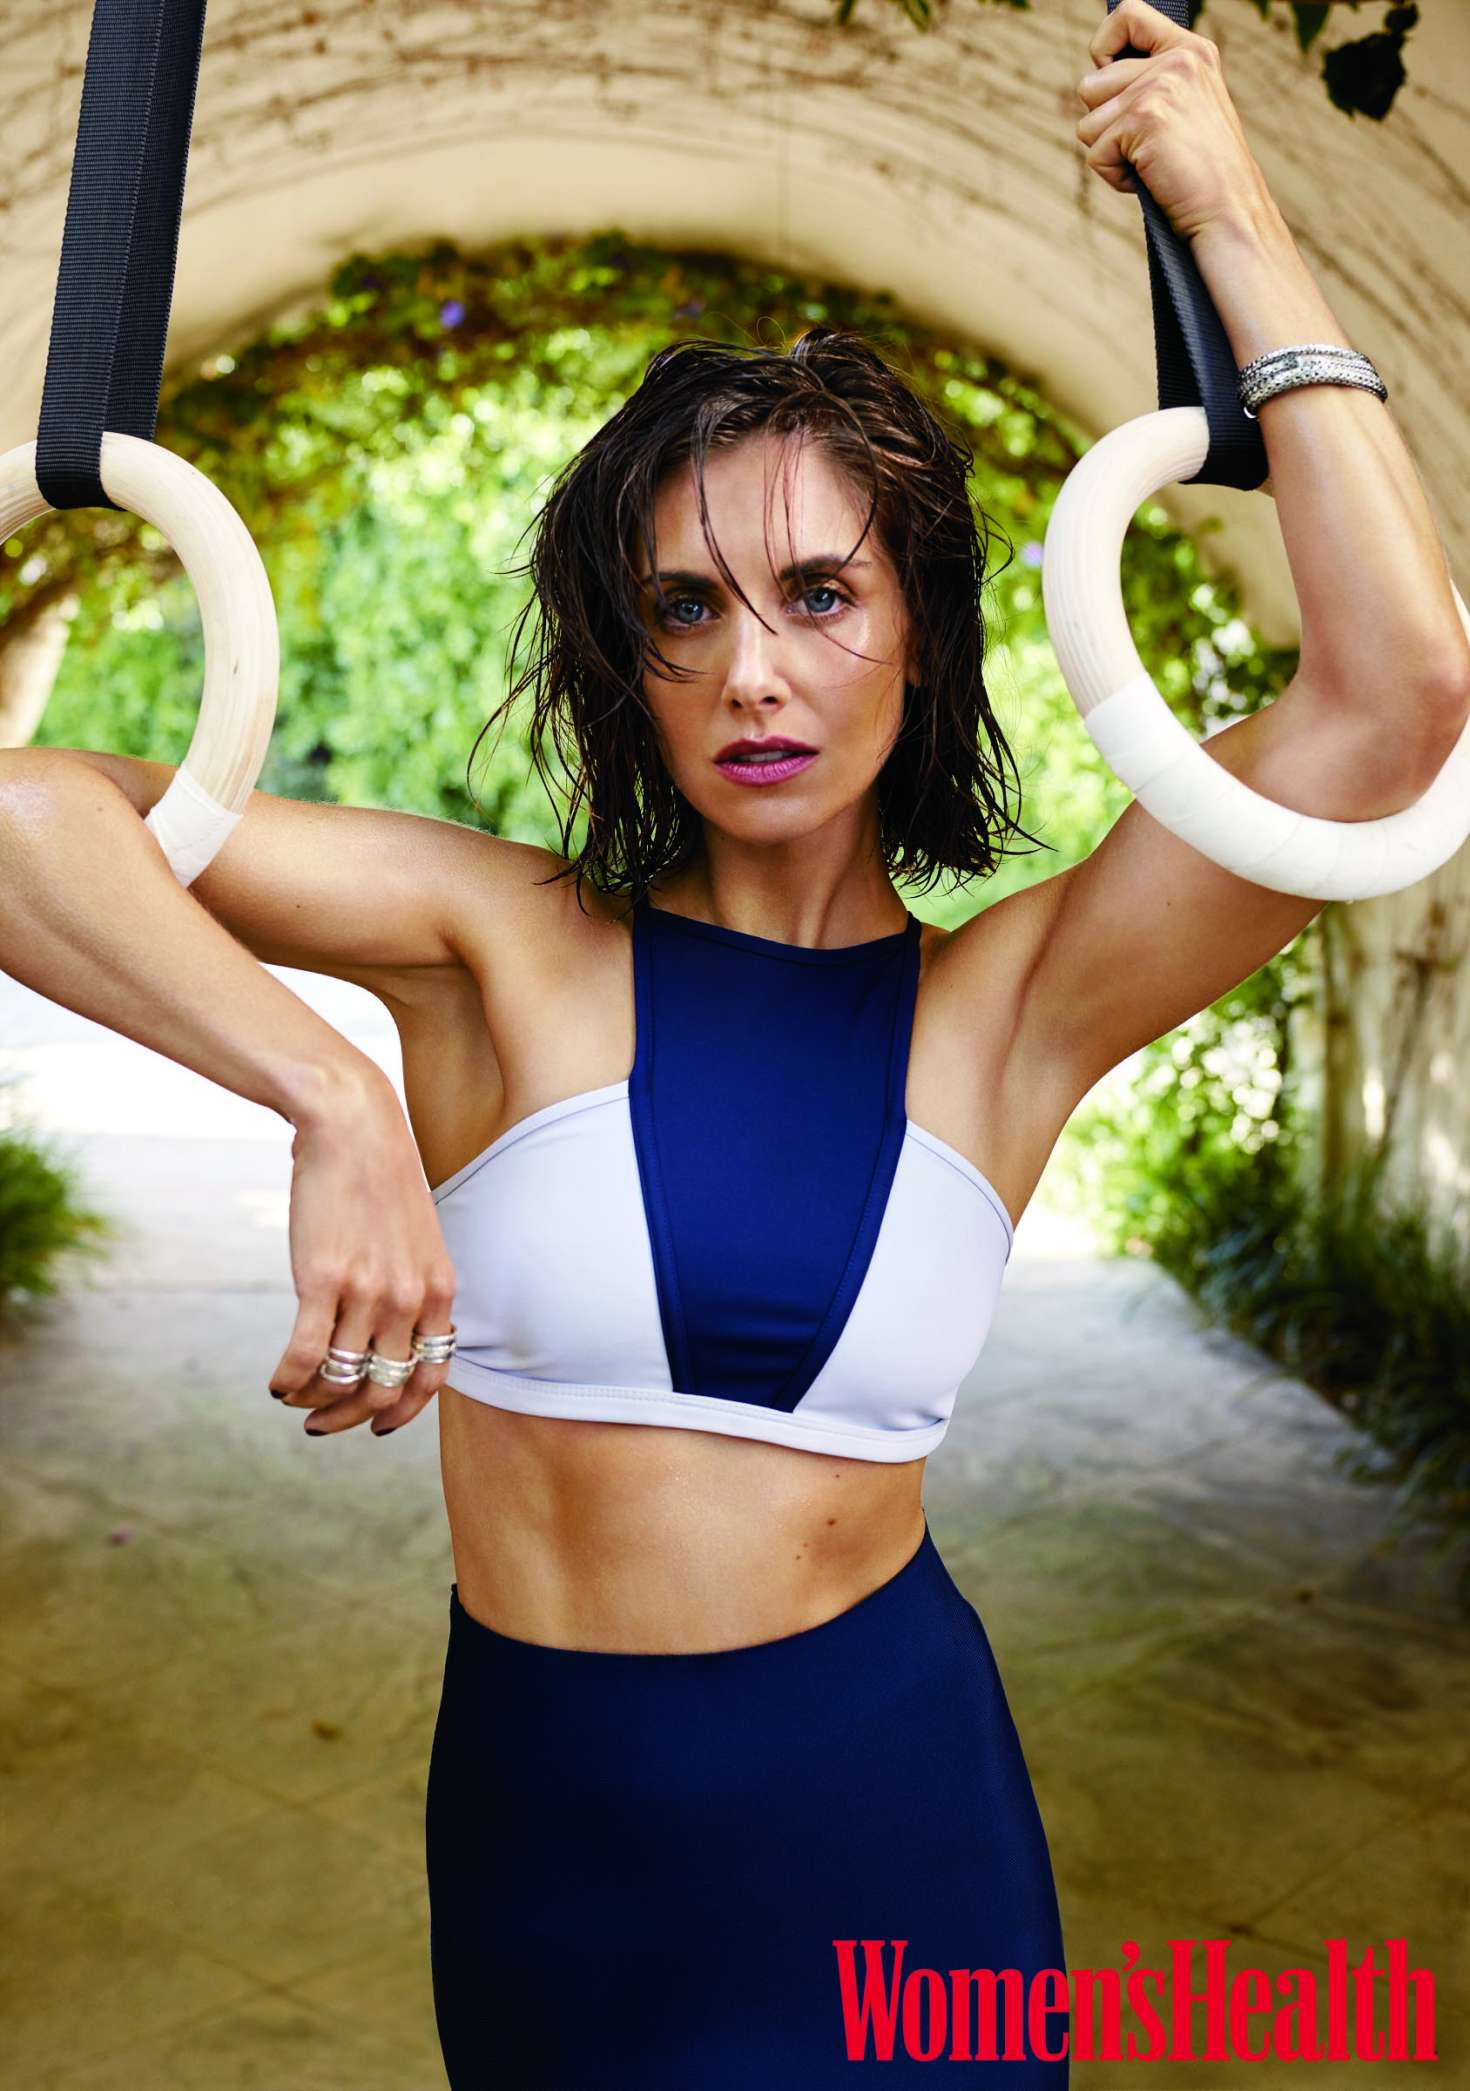 Alison brie women039s health video 5